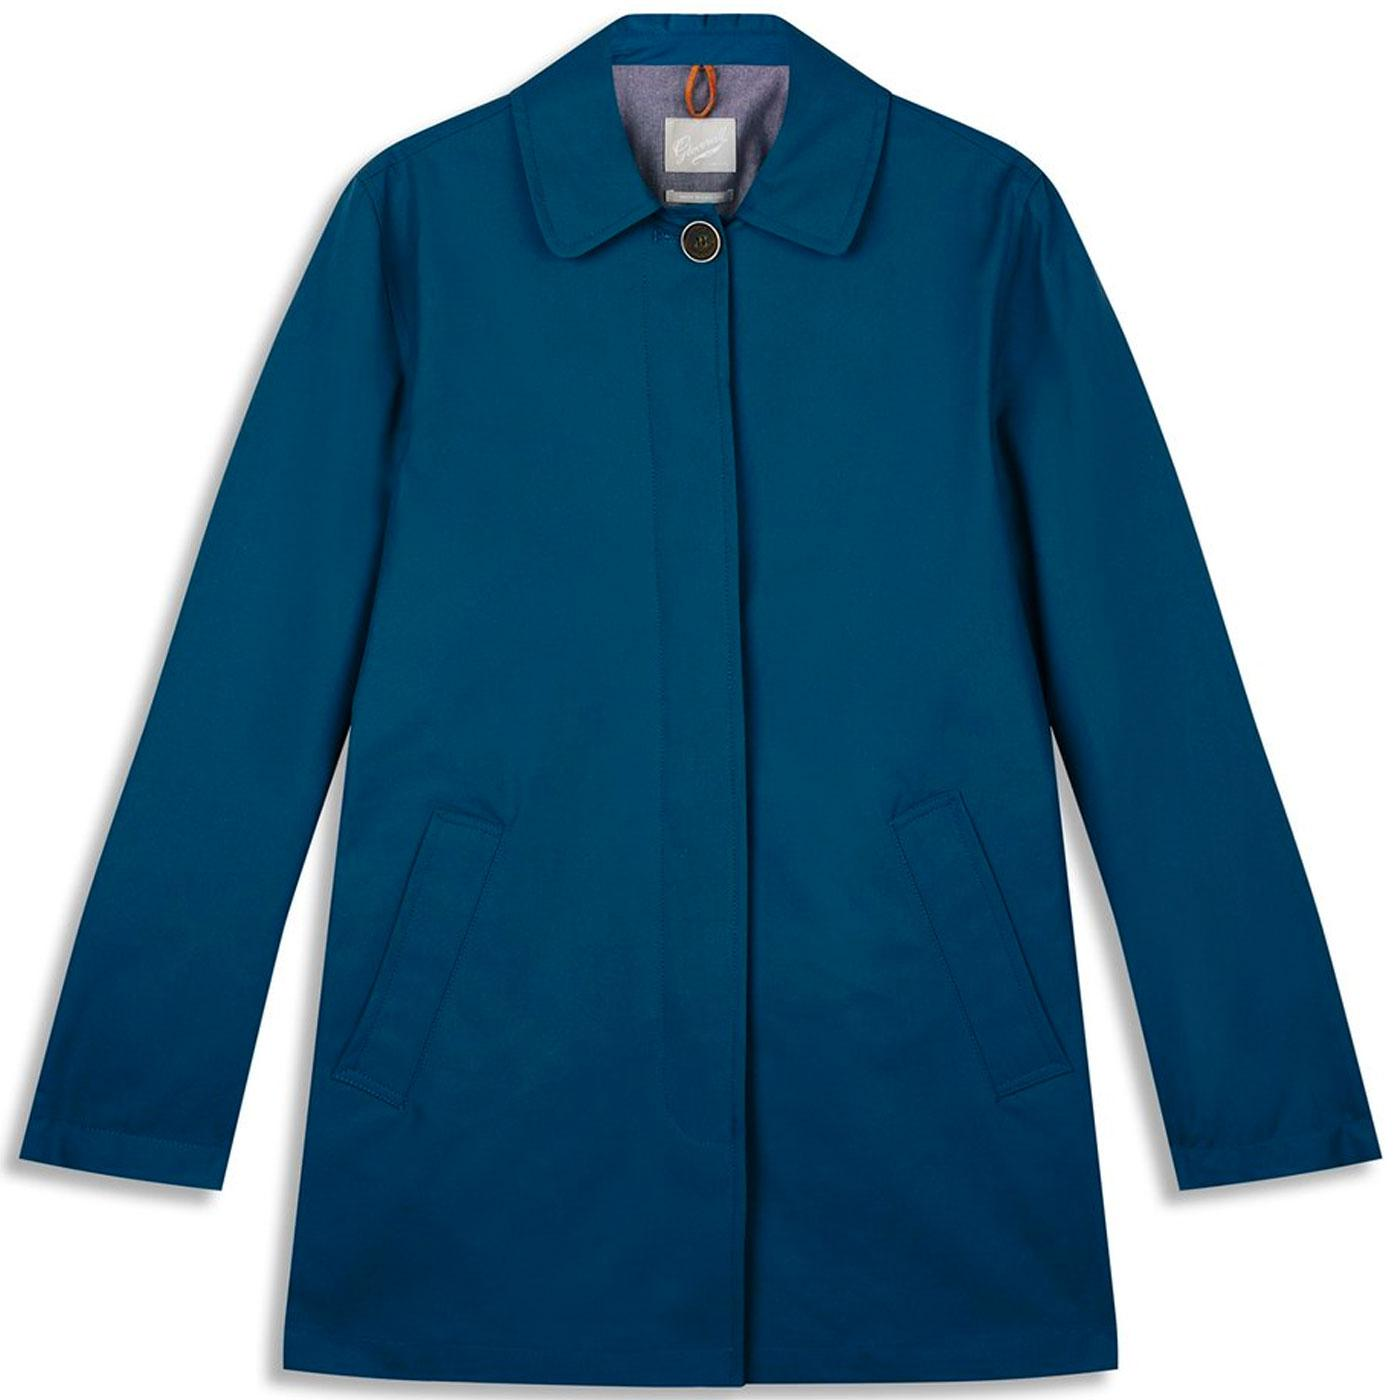 Iris GLOVERALL Women's Made in England Car Coat P